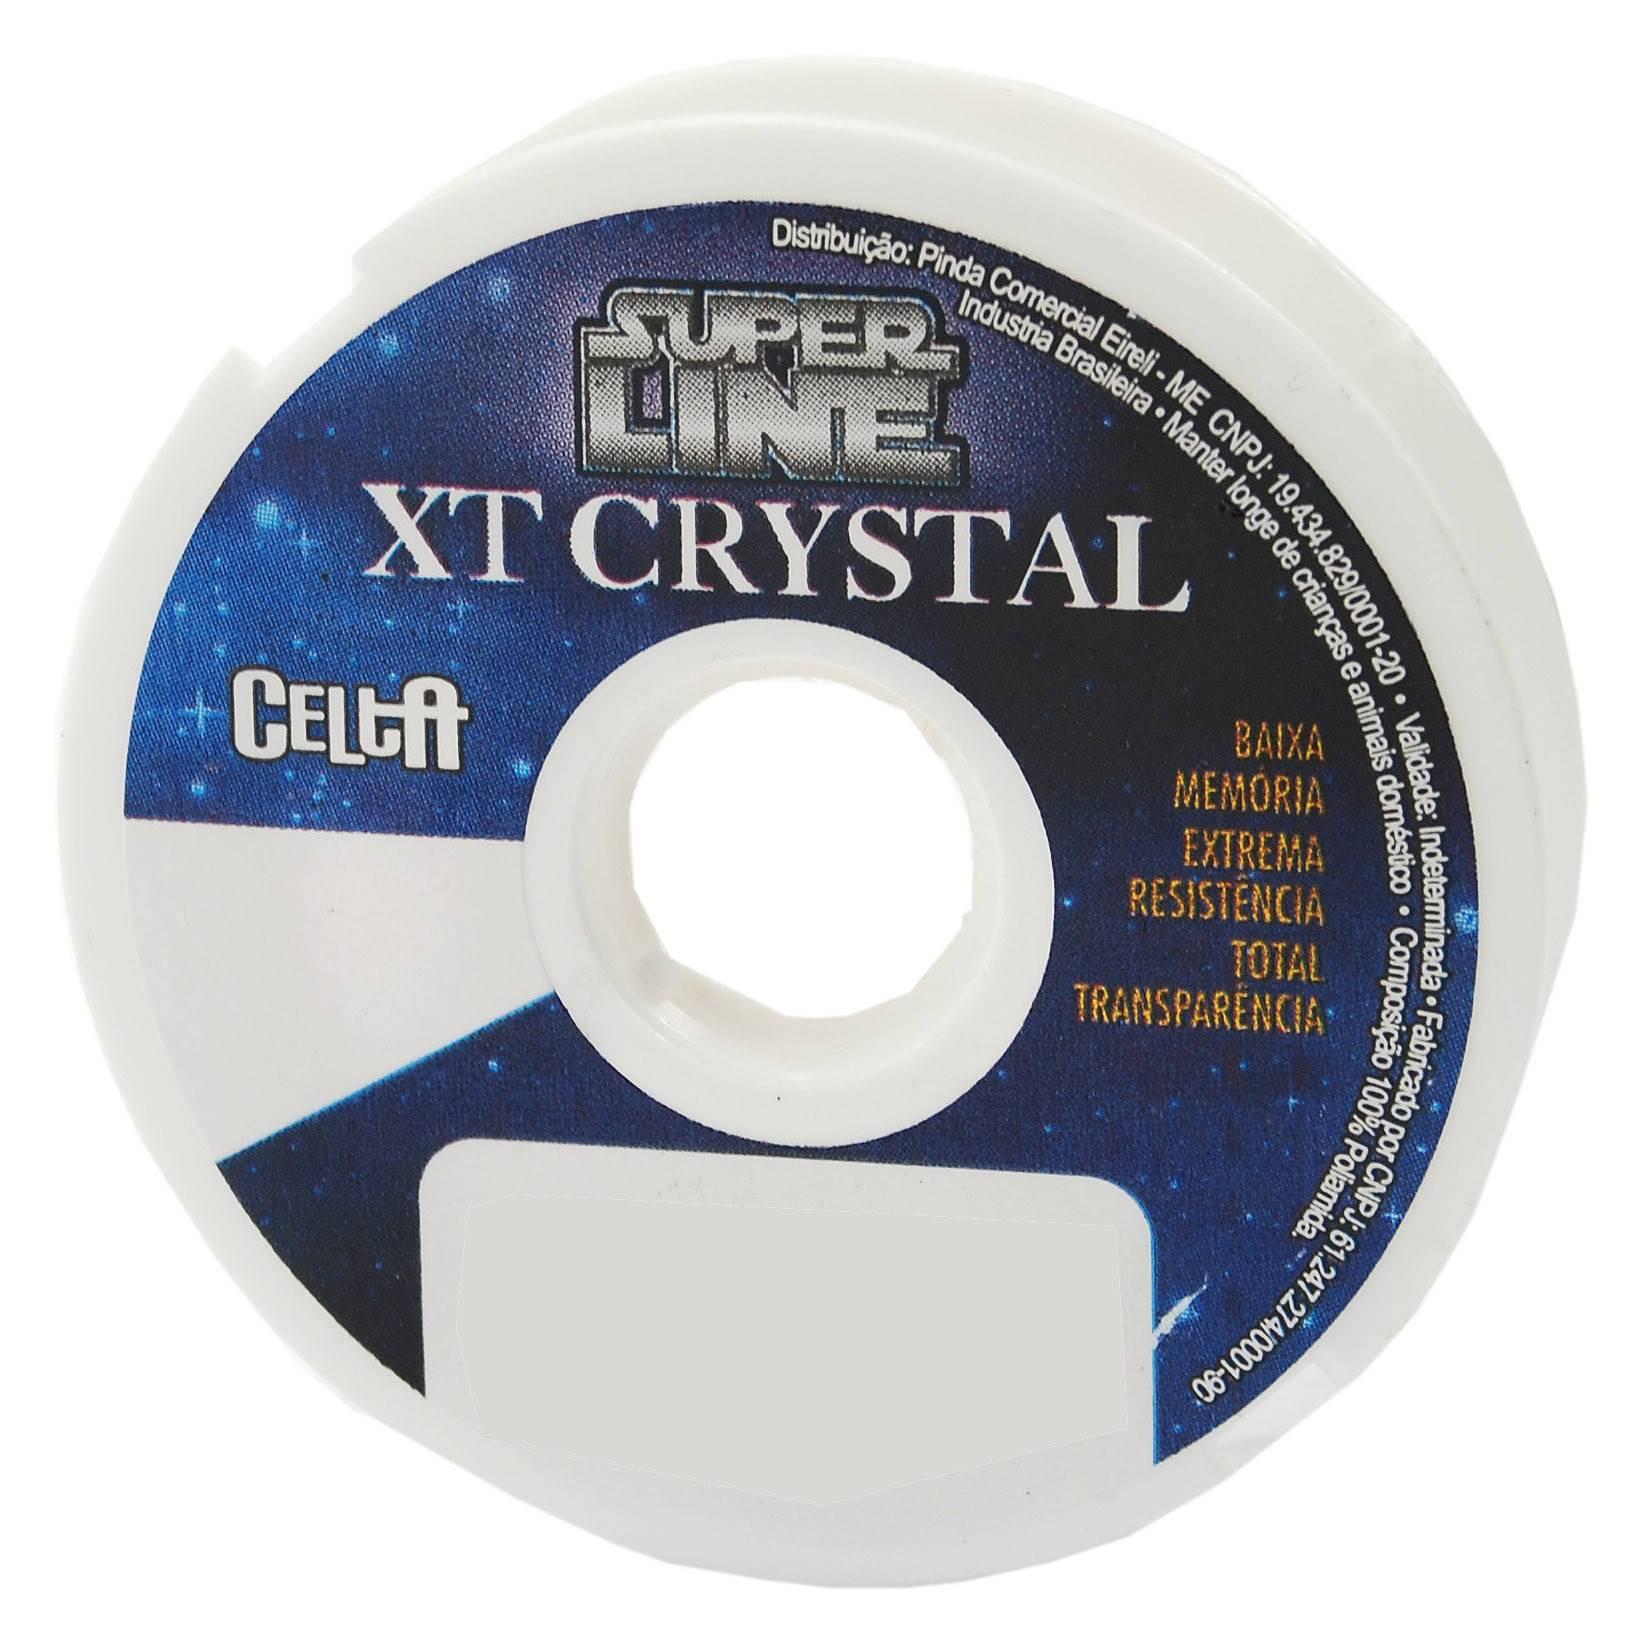 Linha Mono Celta XT Crystal e Titanium 0,33mm 18,1lbs/8,2kg - 120 Metros